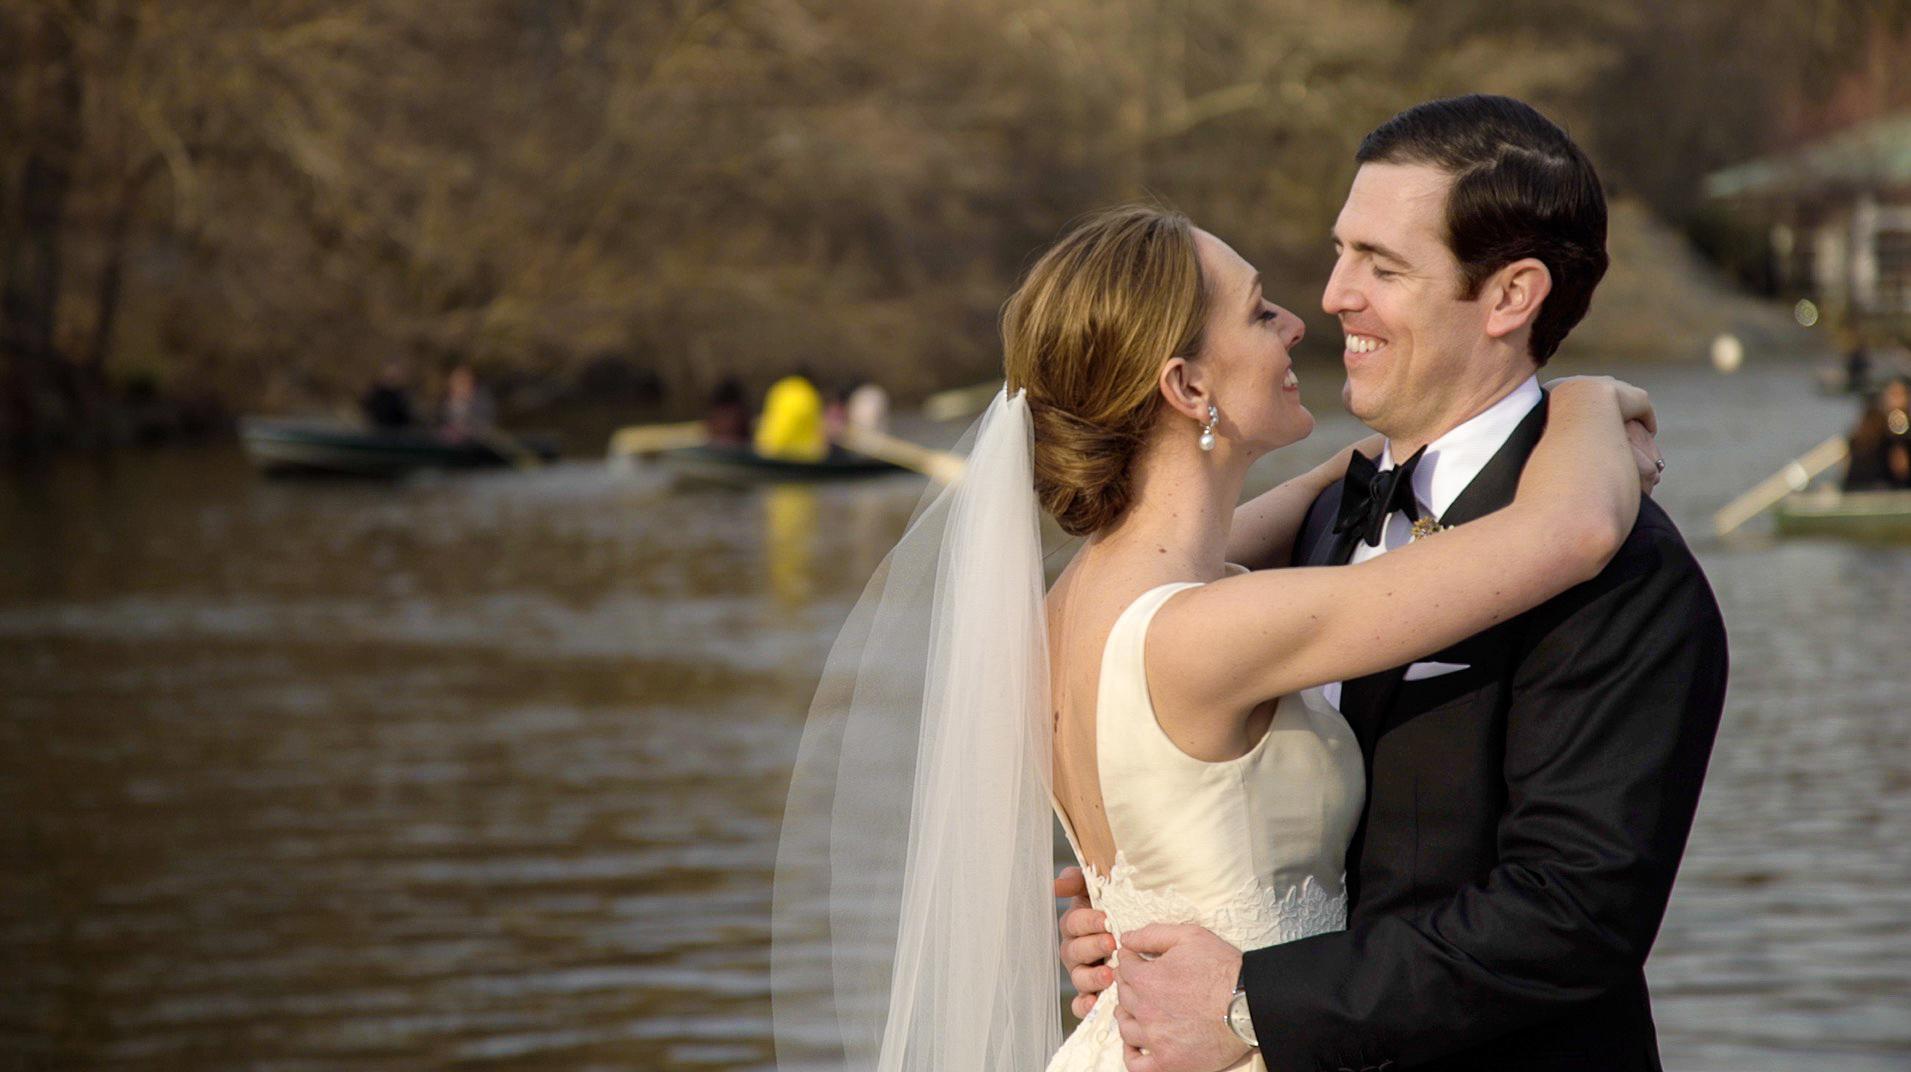 Amanda + Will   New York, New York   Central Park Boathouse